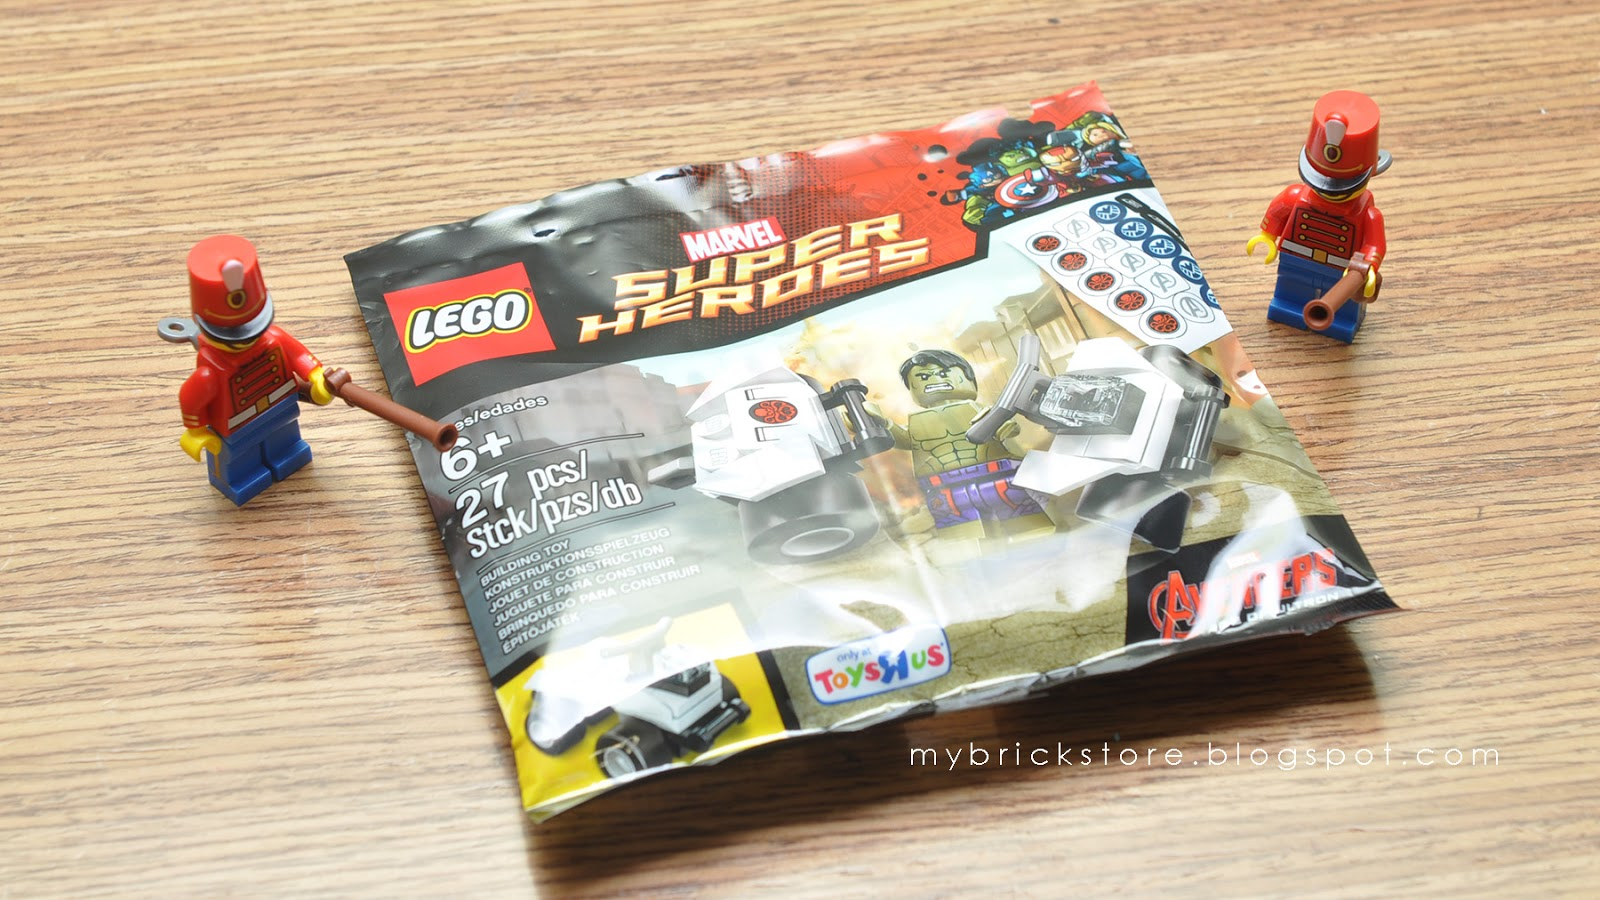 My Brick Store: Lego Bricktober 2015 and Star Wars ...